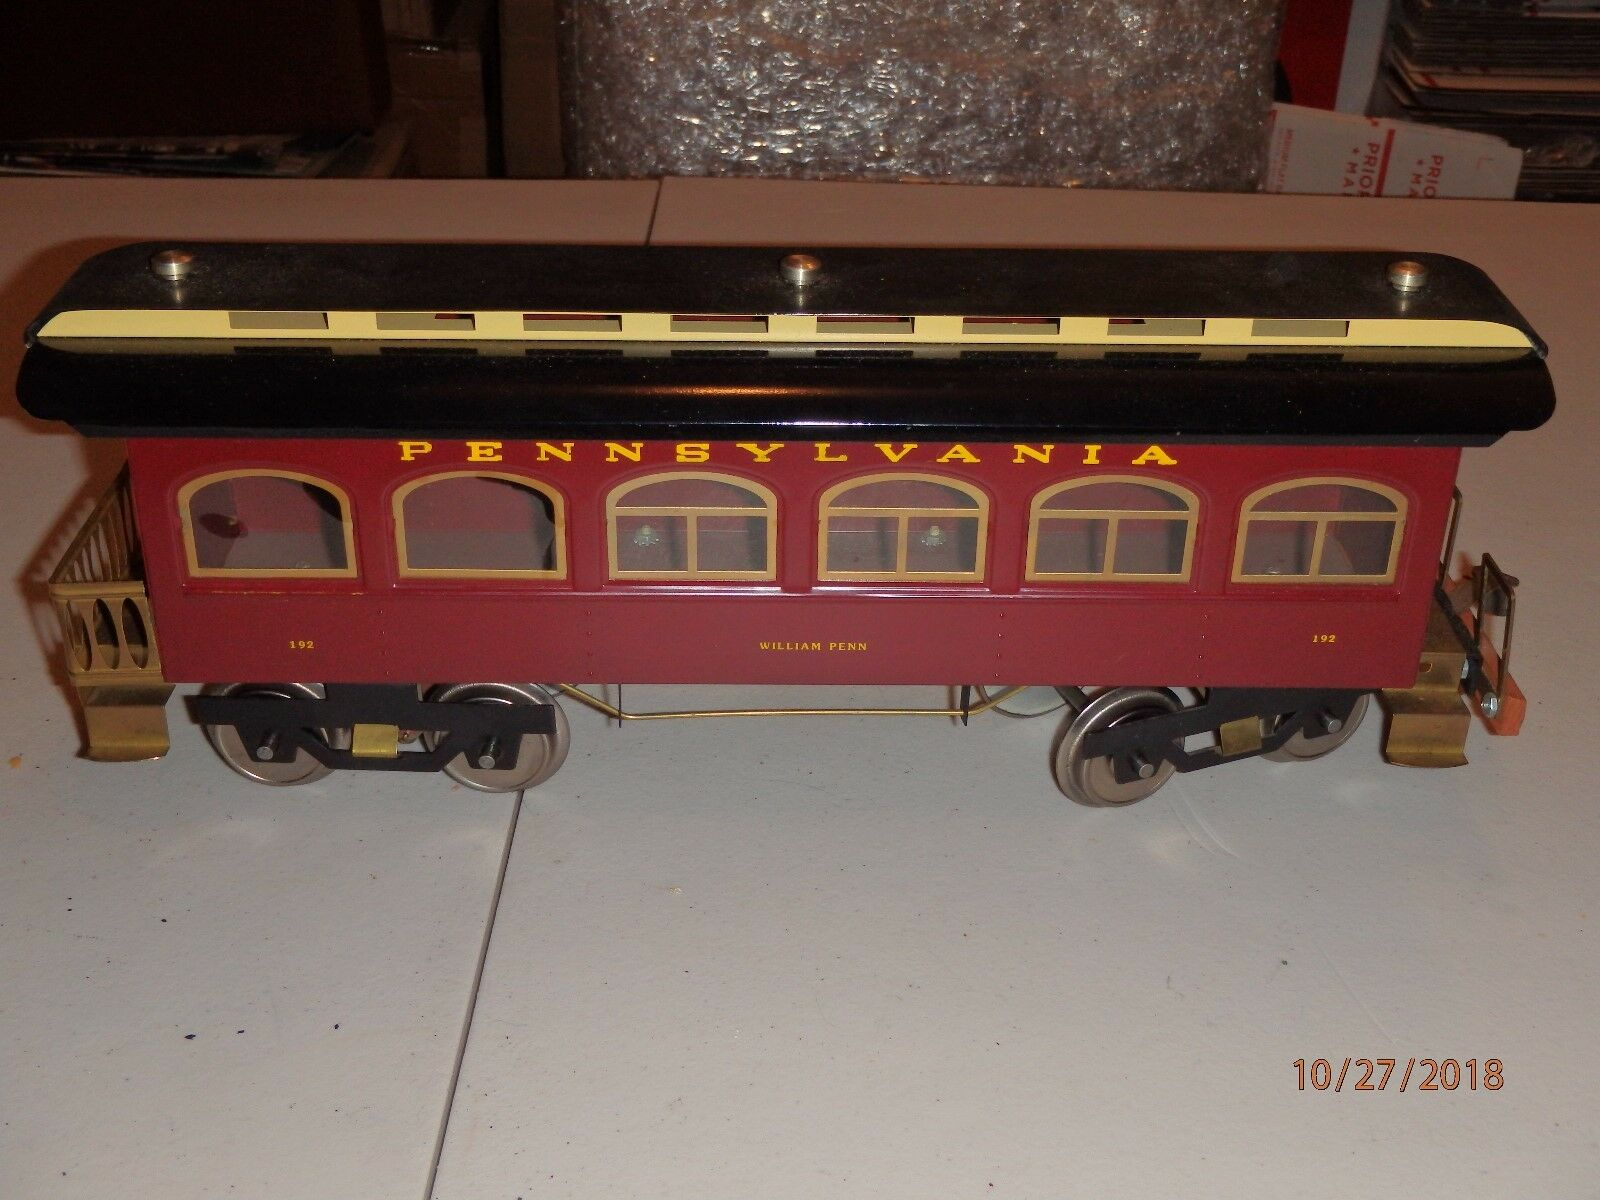 Classic Modell Trains Standard Pennsylvania William Penn 192 Passenger Lichted